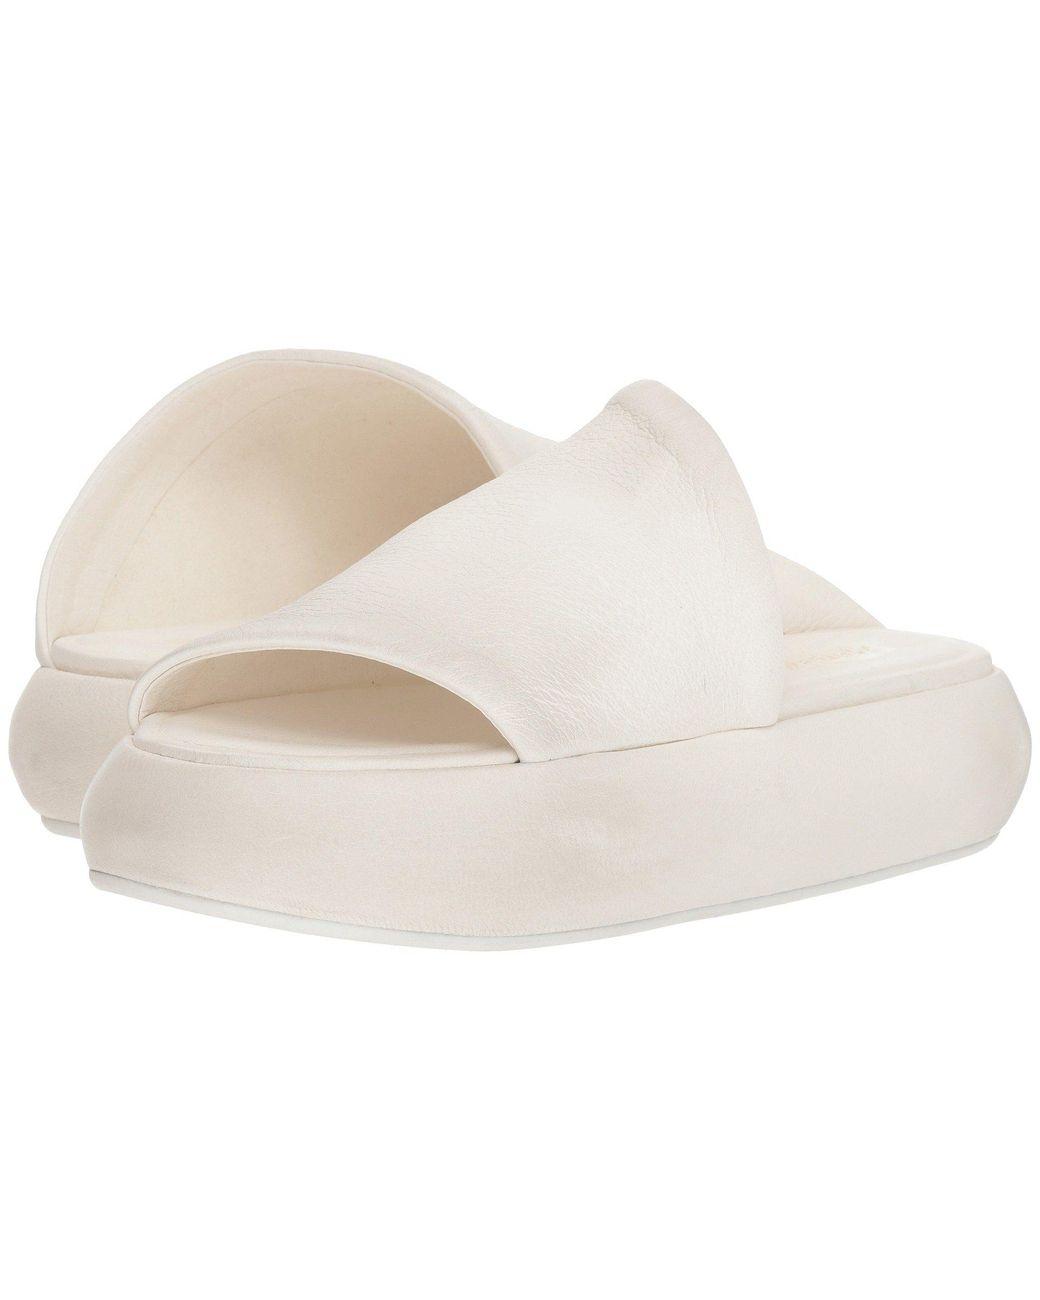 3aca4483143 Lyst - Marsèll Platform Sandal in White - Save 55%